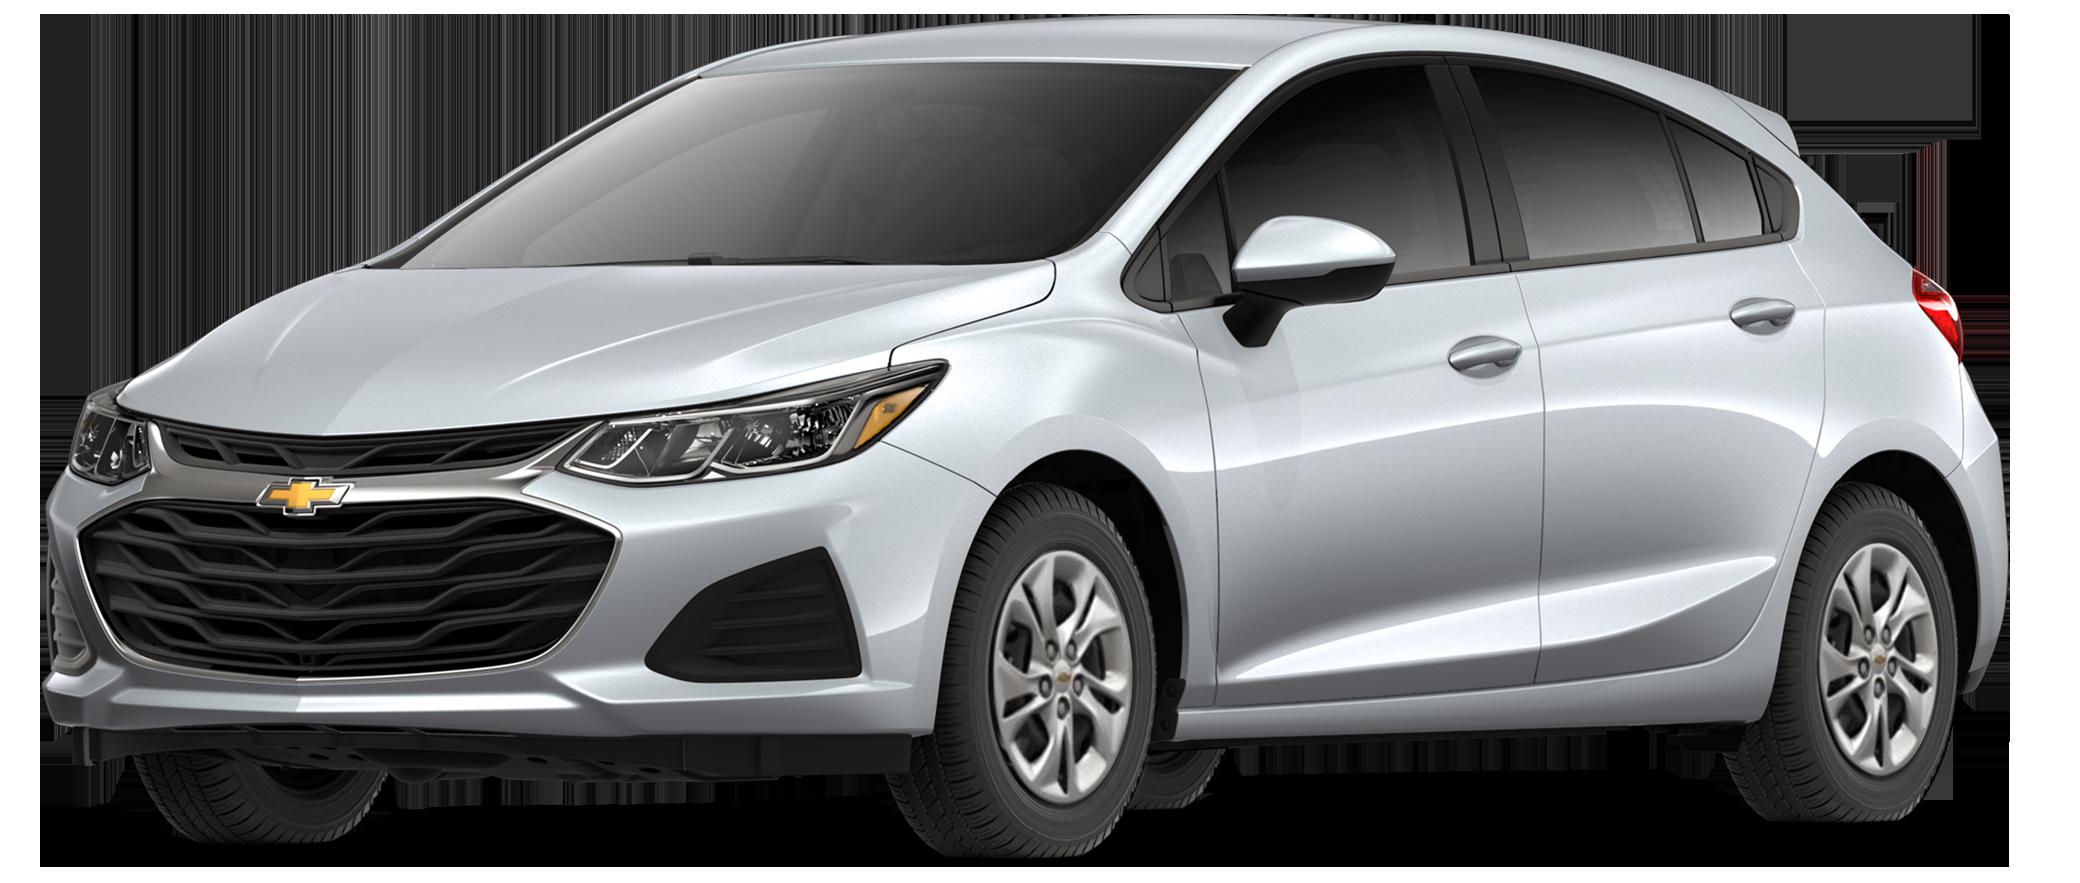 2019 Chevrolet Cruze Incentives, Specials & Offers in Phoenix AZ